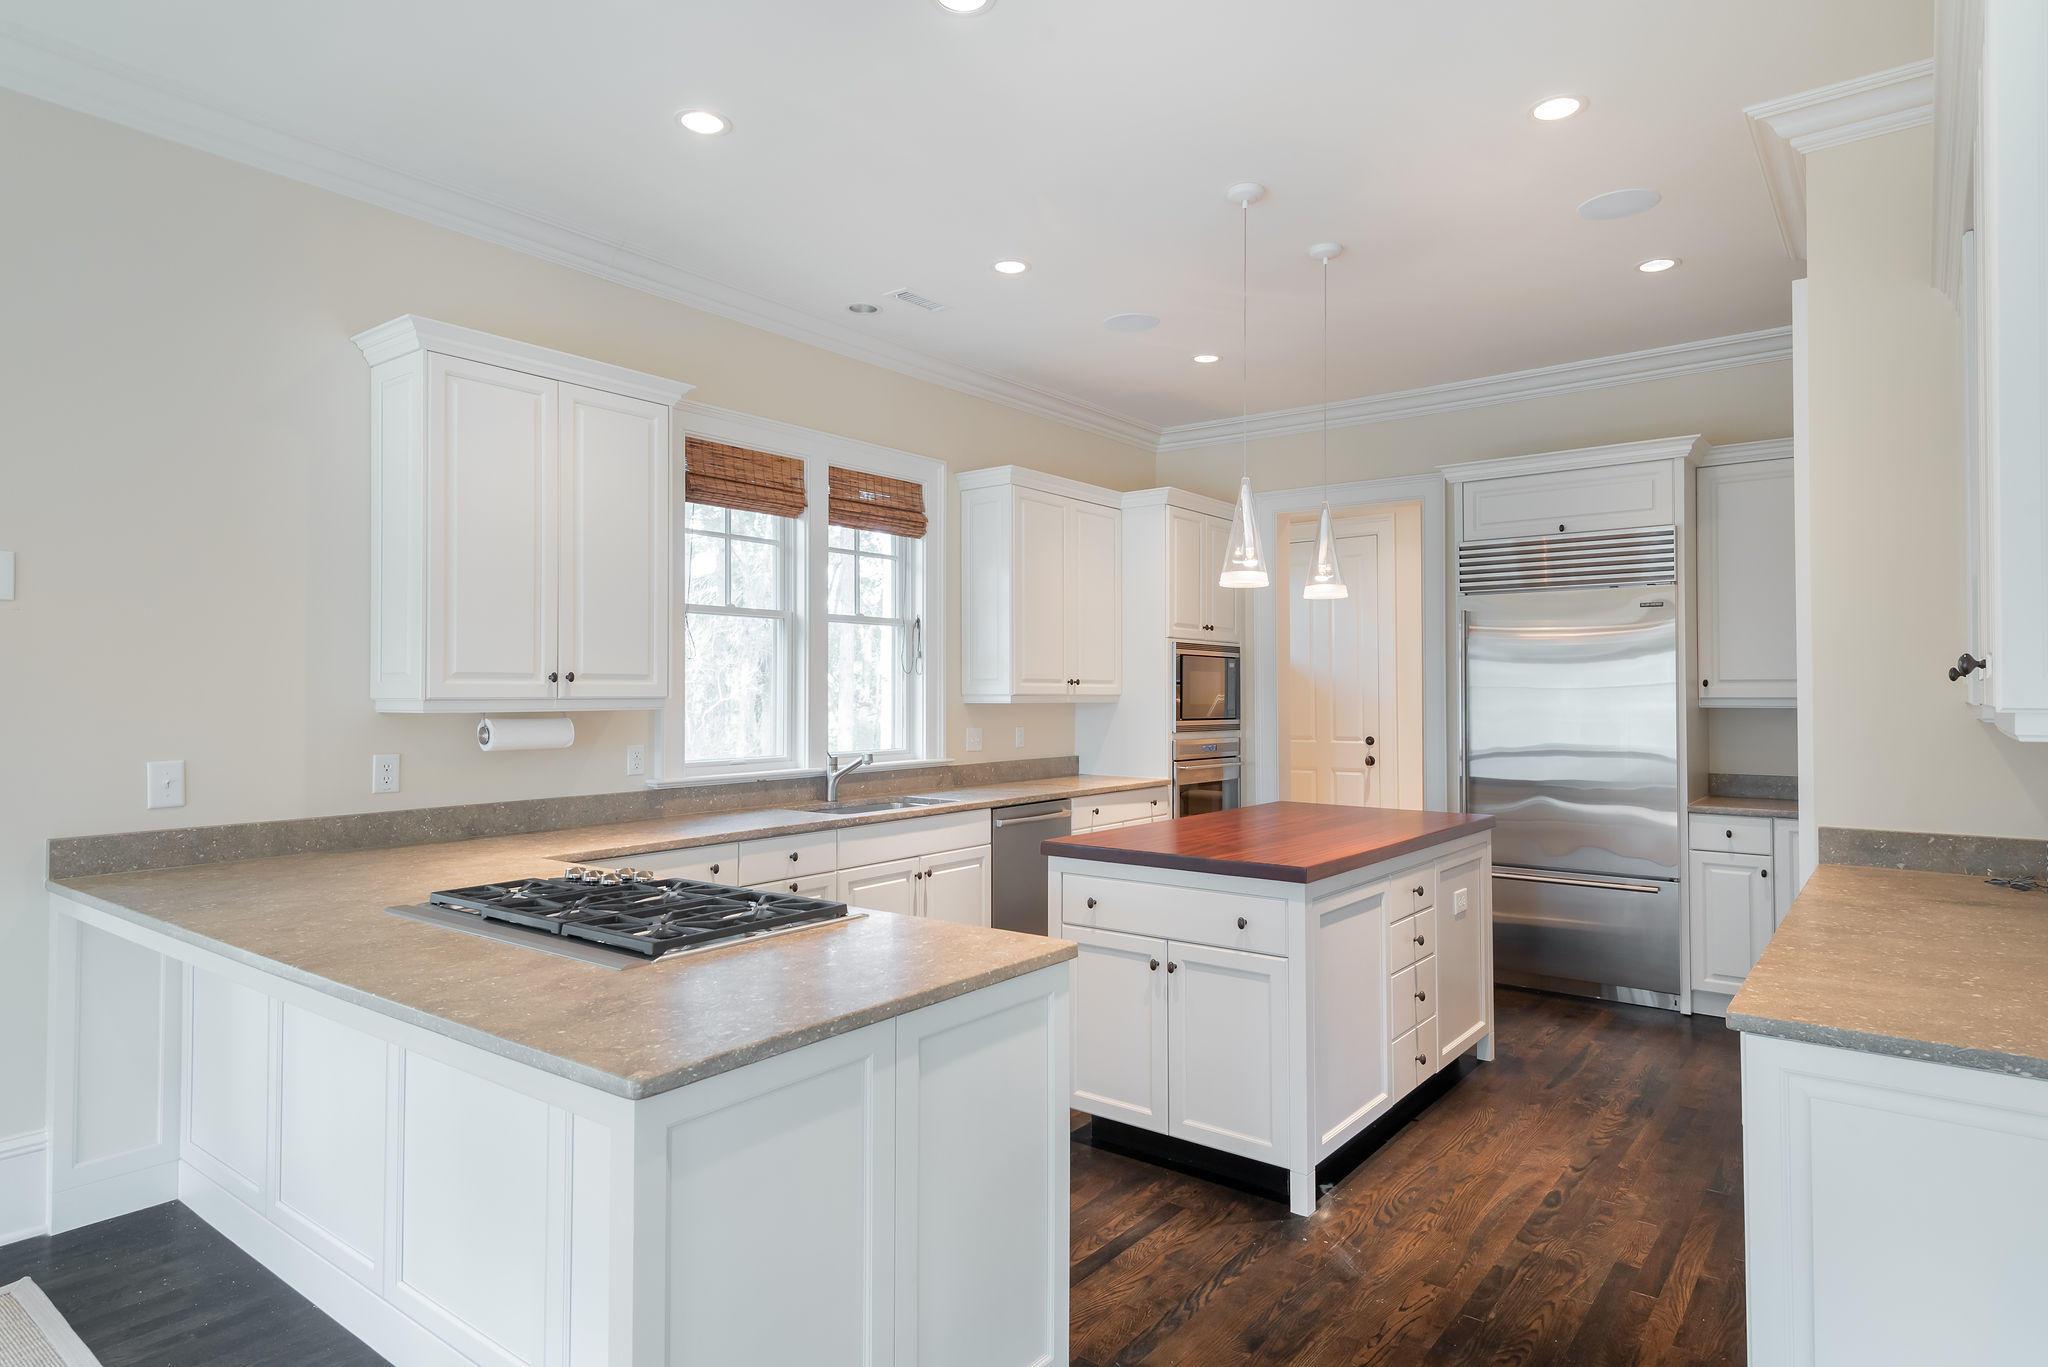 Kiawah Island Homes For Sale - 3 Grey Widgeon, Kiawah Island, SC - 53